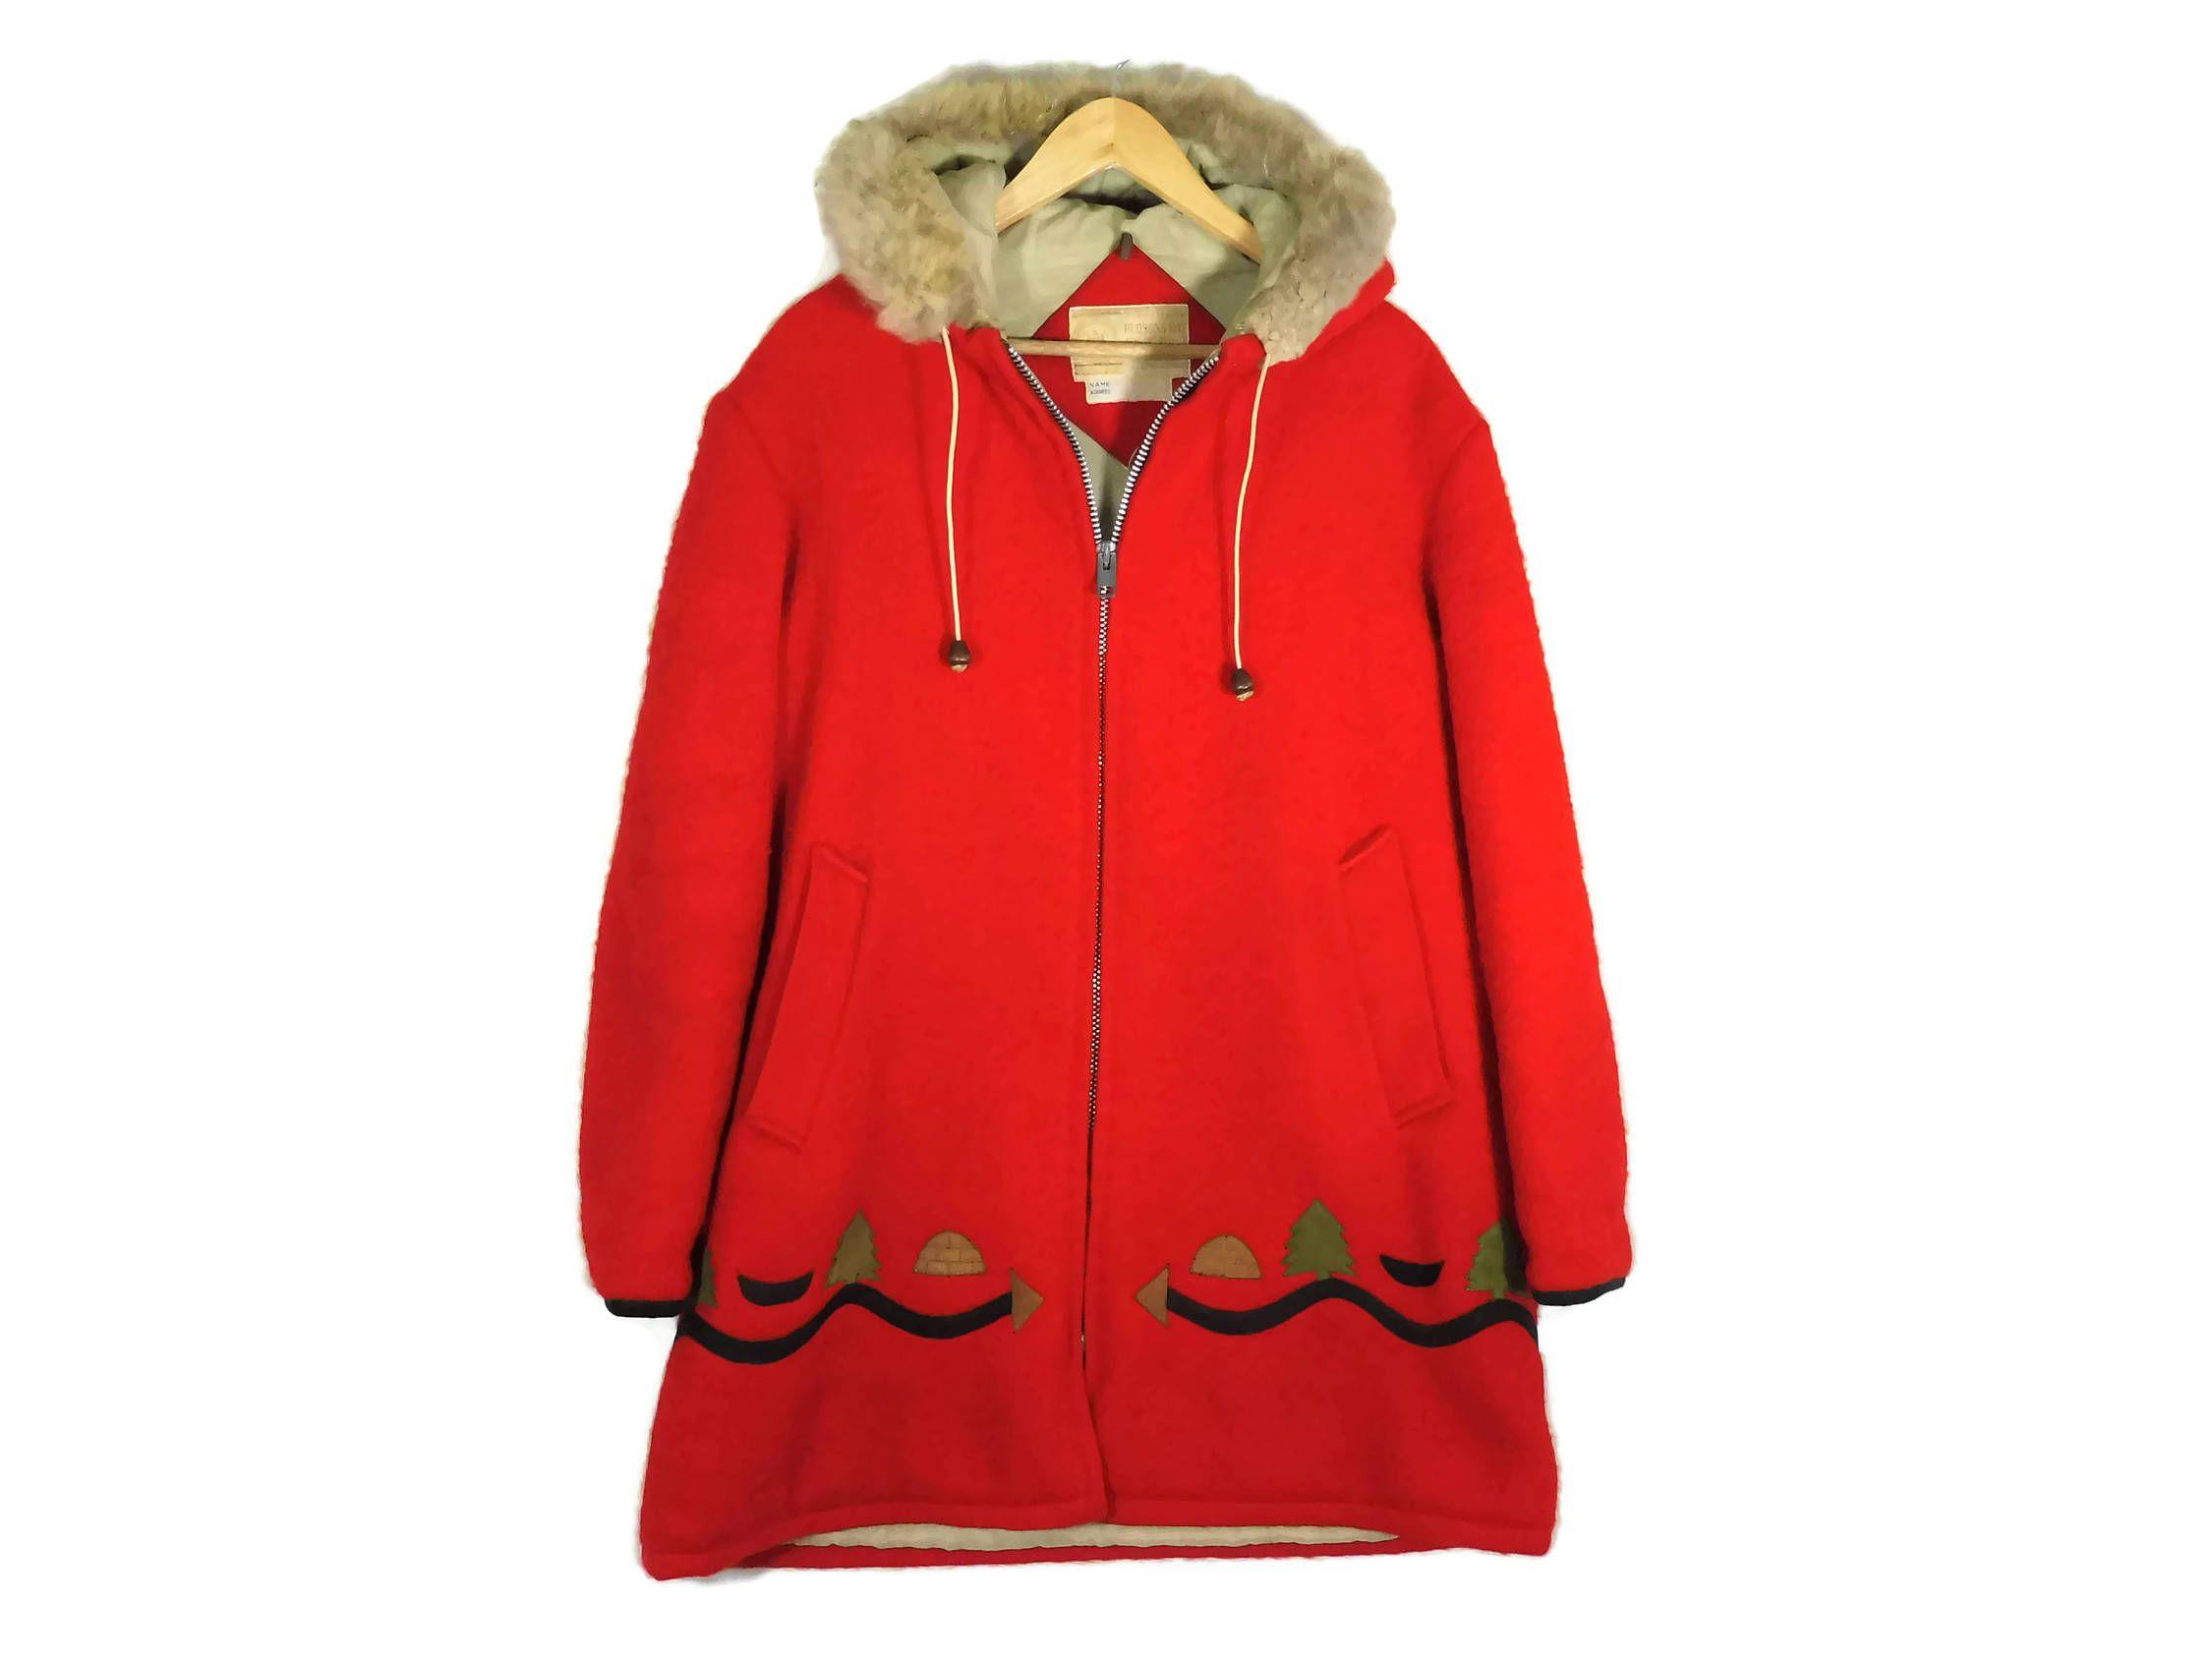 Vintage 1960s Hudsons Bay Red Parka Medium Wool Coat